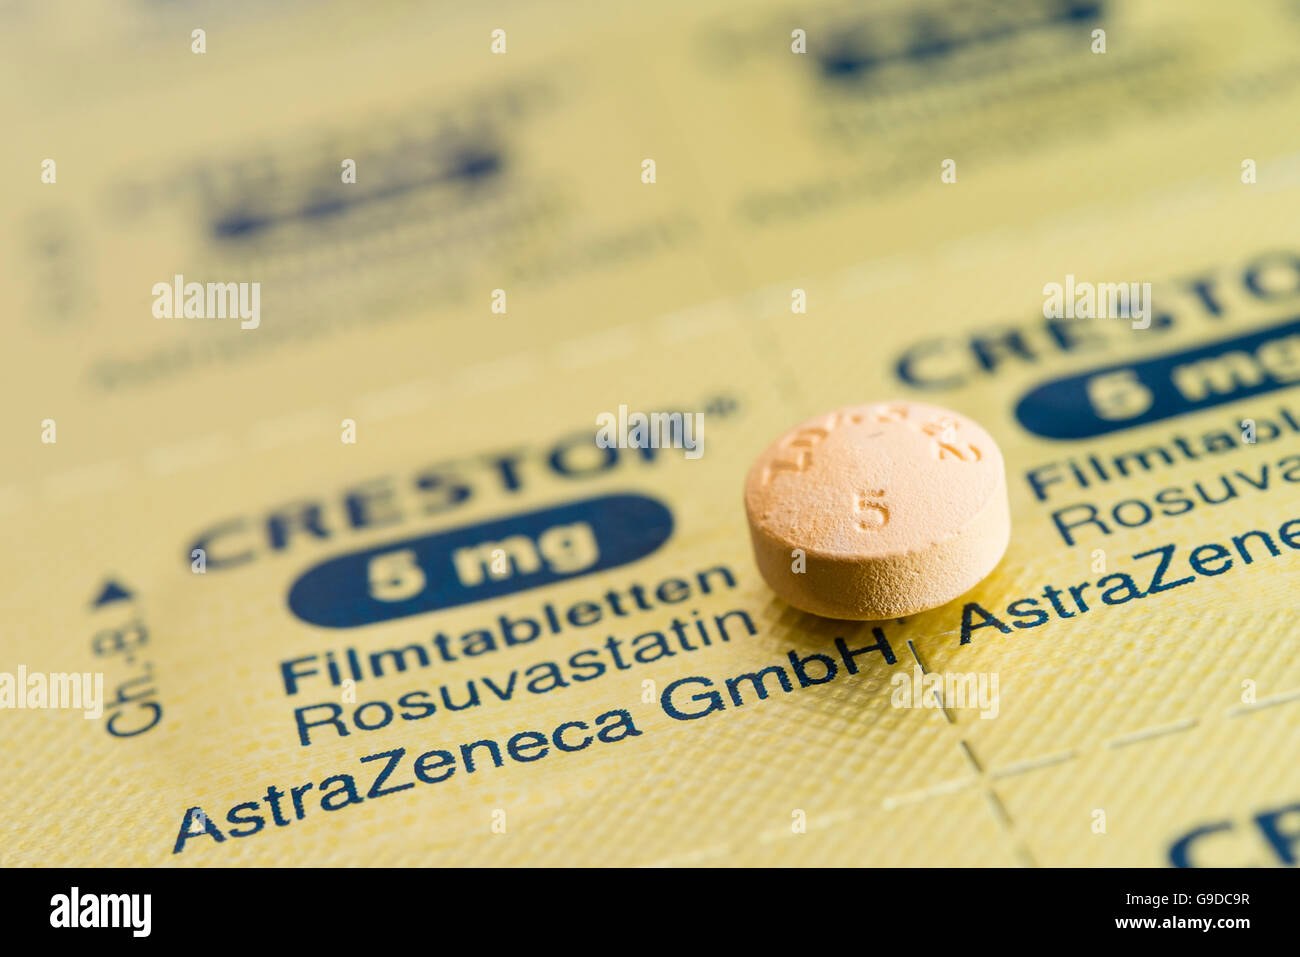 Tablet und Folie Blister-Packung für Crestor gebrandmarkt Statine Cholesterin senken Pillen. Stockbild